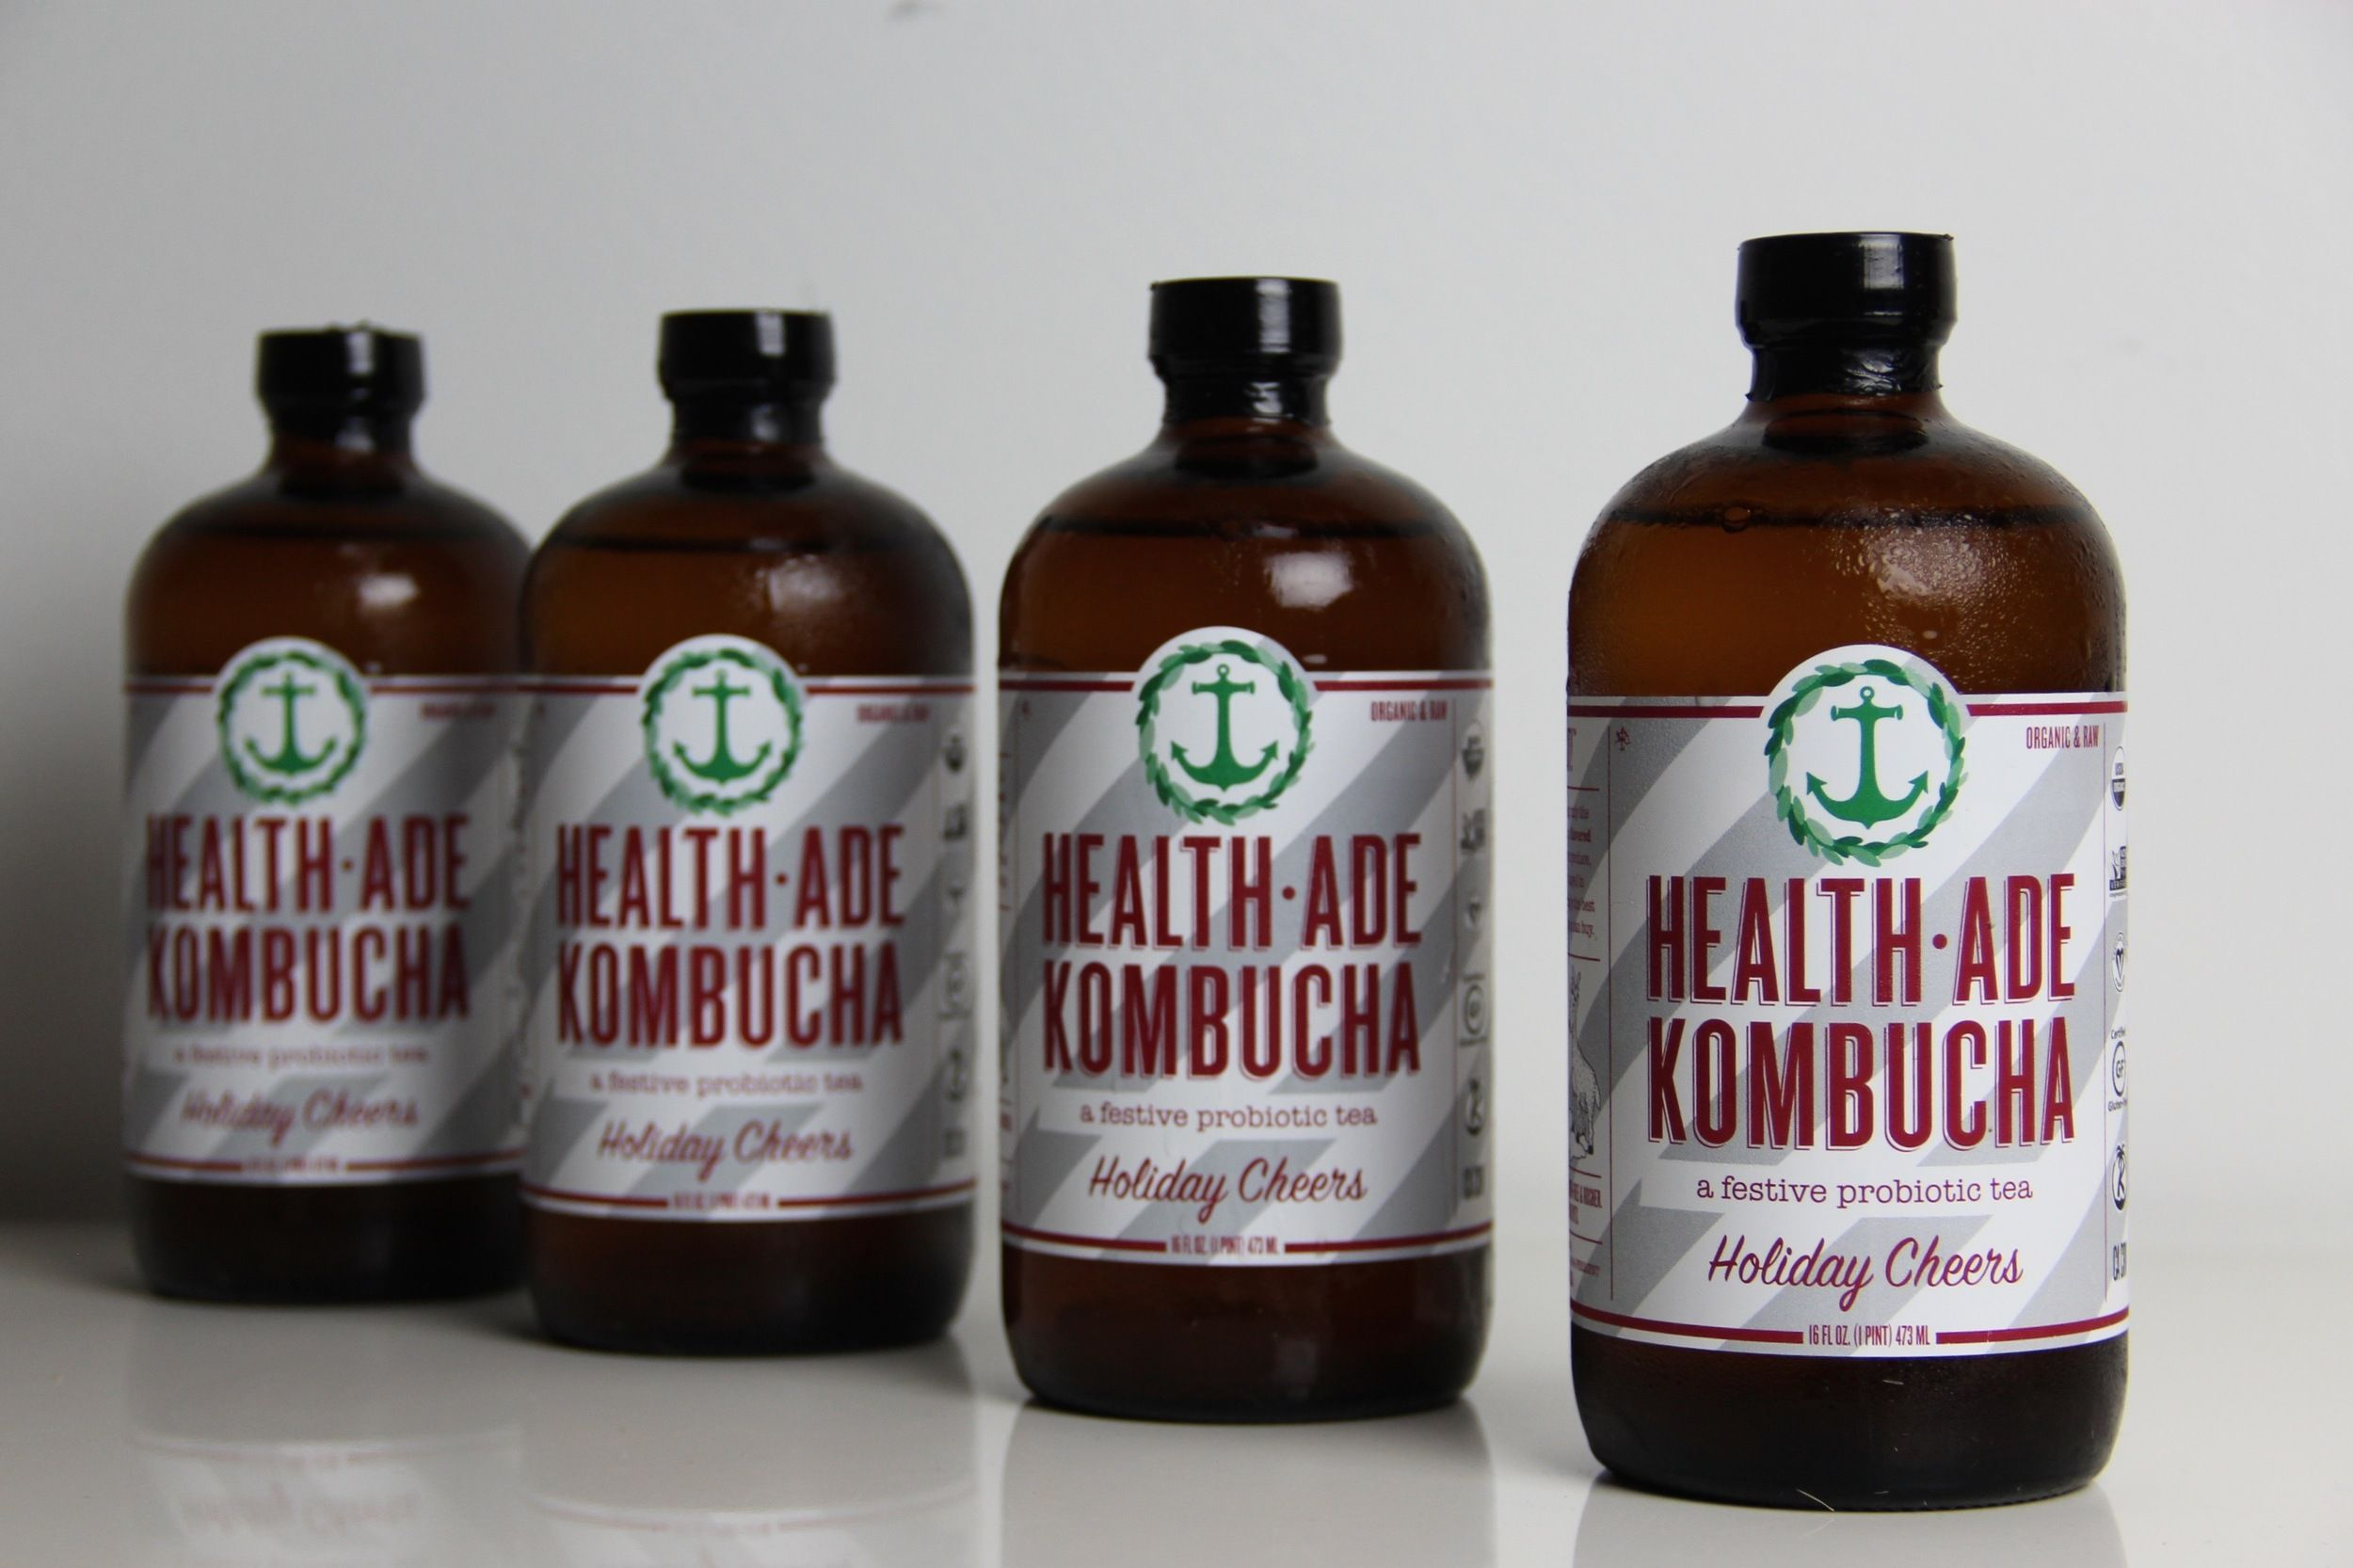 HEALTH-ADE KOMBACHA: Holiday Cheers — The Dieline - Branding & Packaging